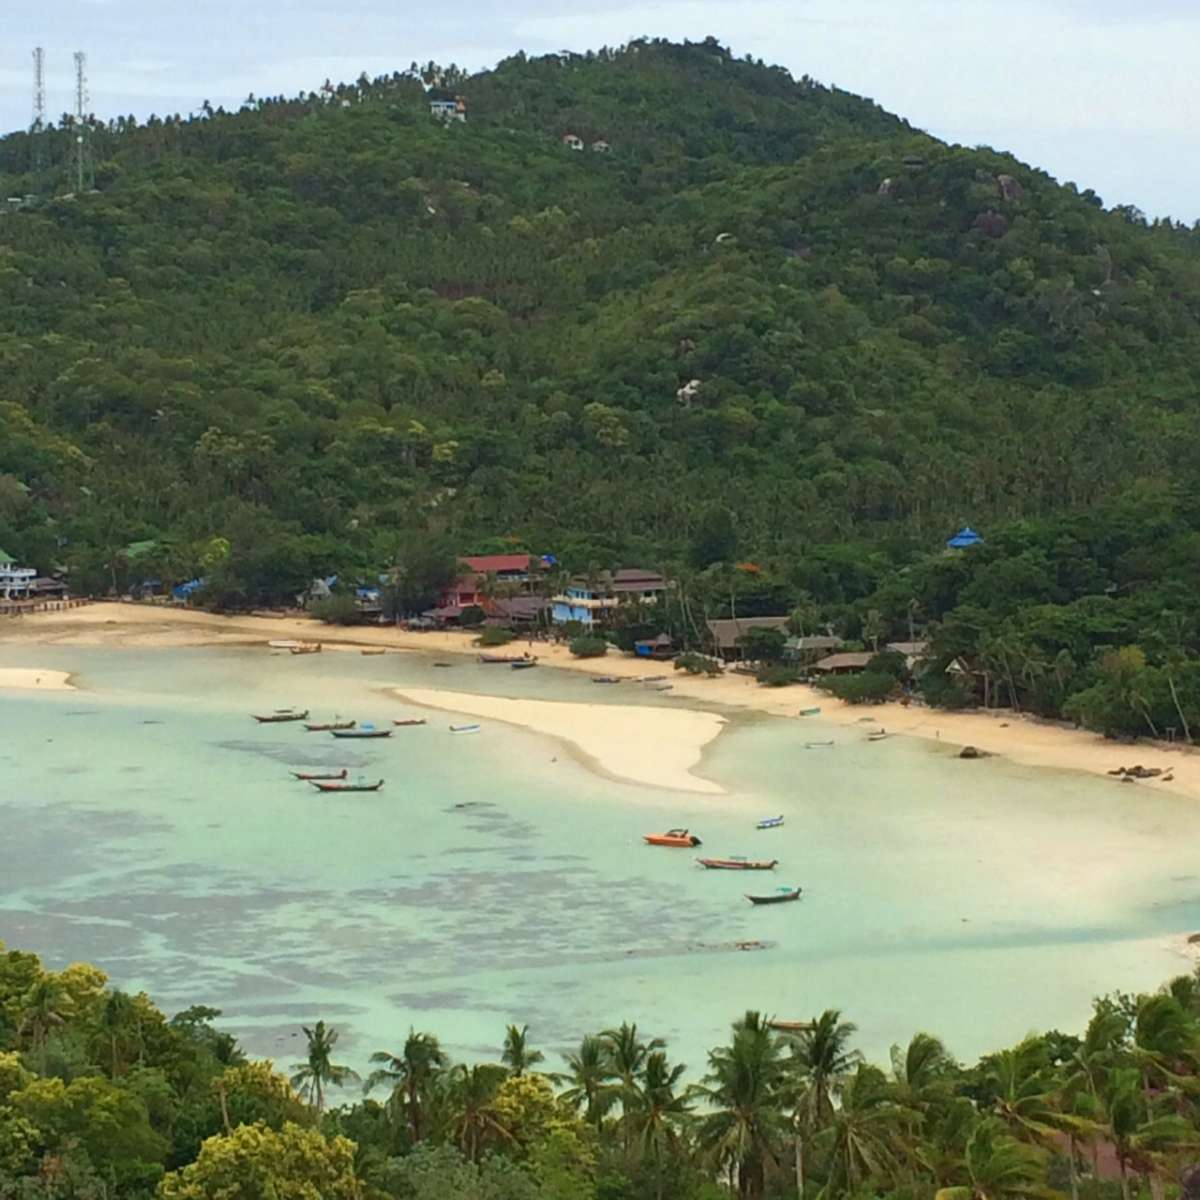 Chalok Bay, Koh Tao, Thailand